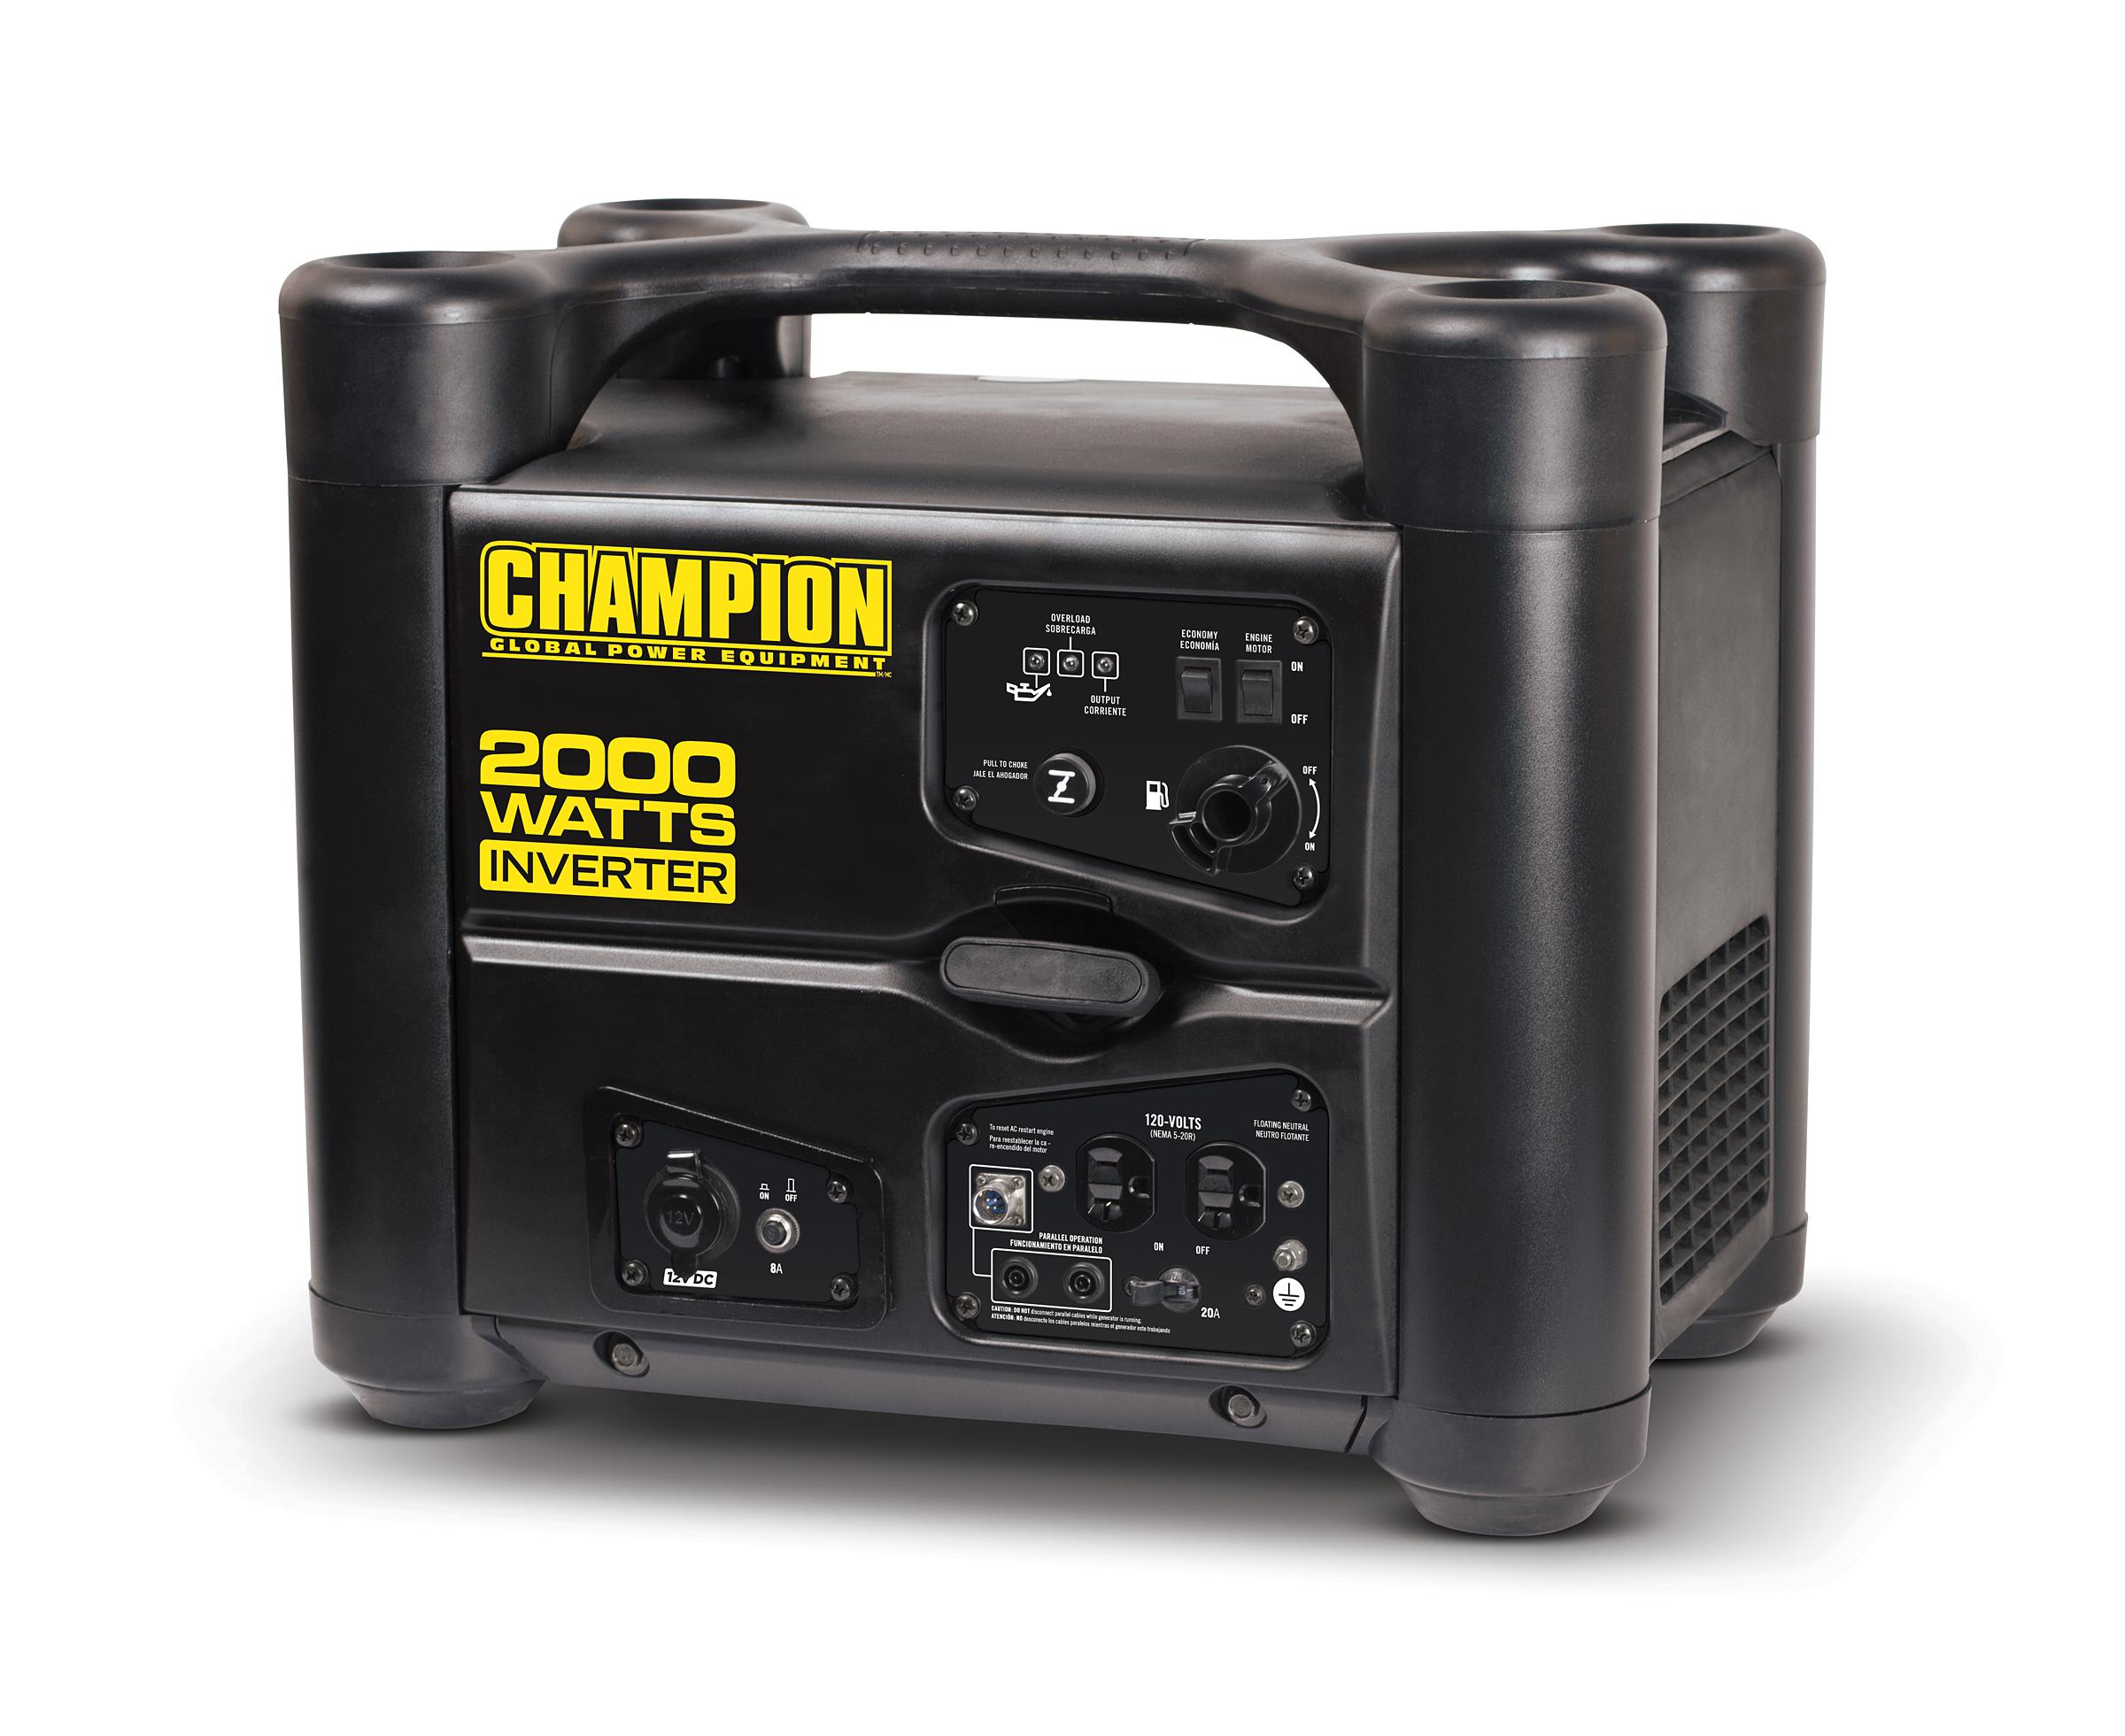 Champion Inverter Generator 2000 Watt Idle Control 53 dB CARB